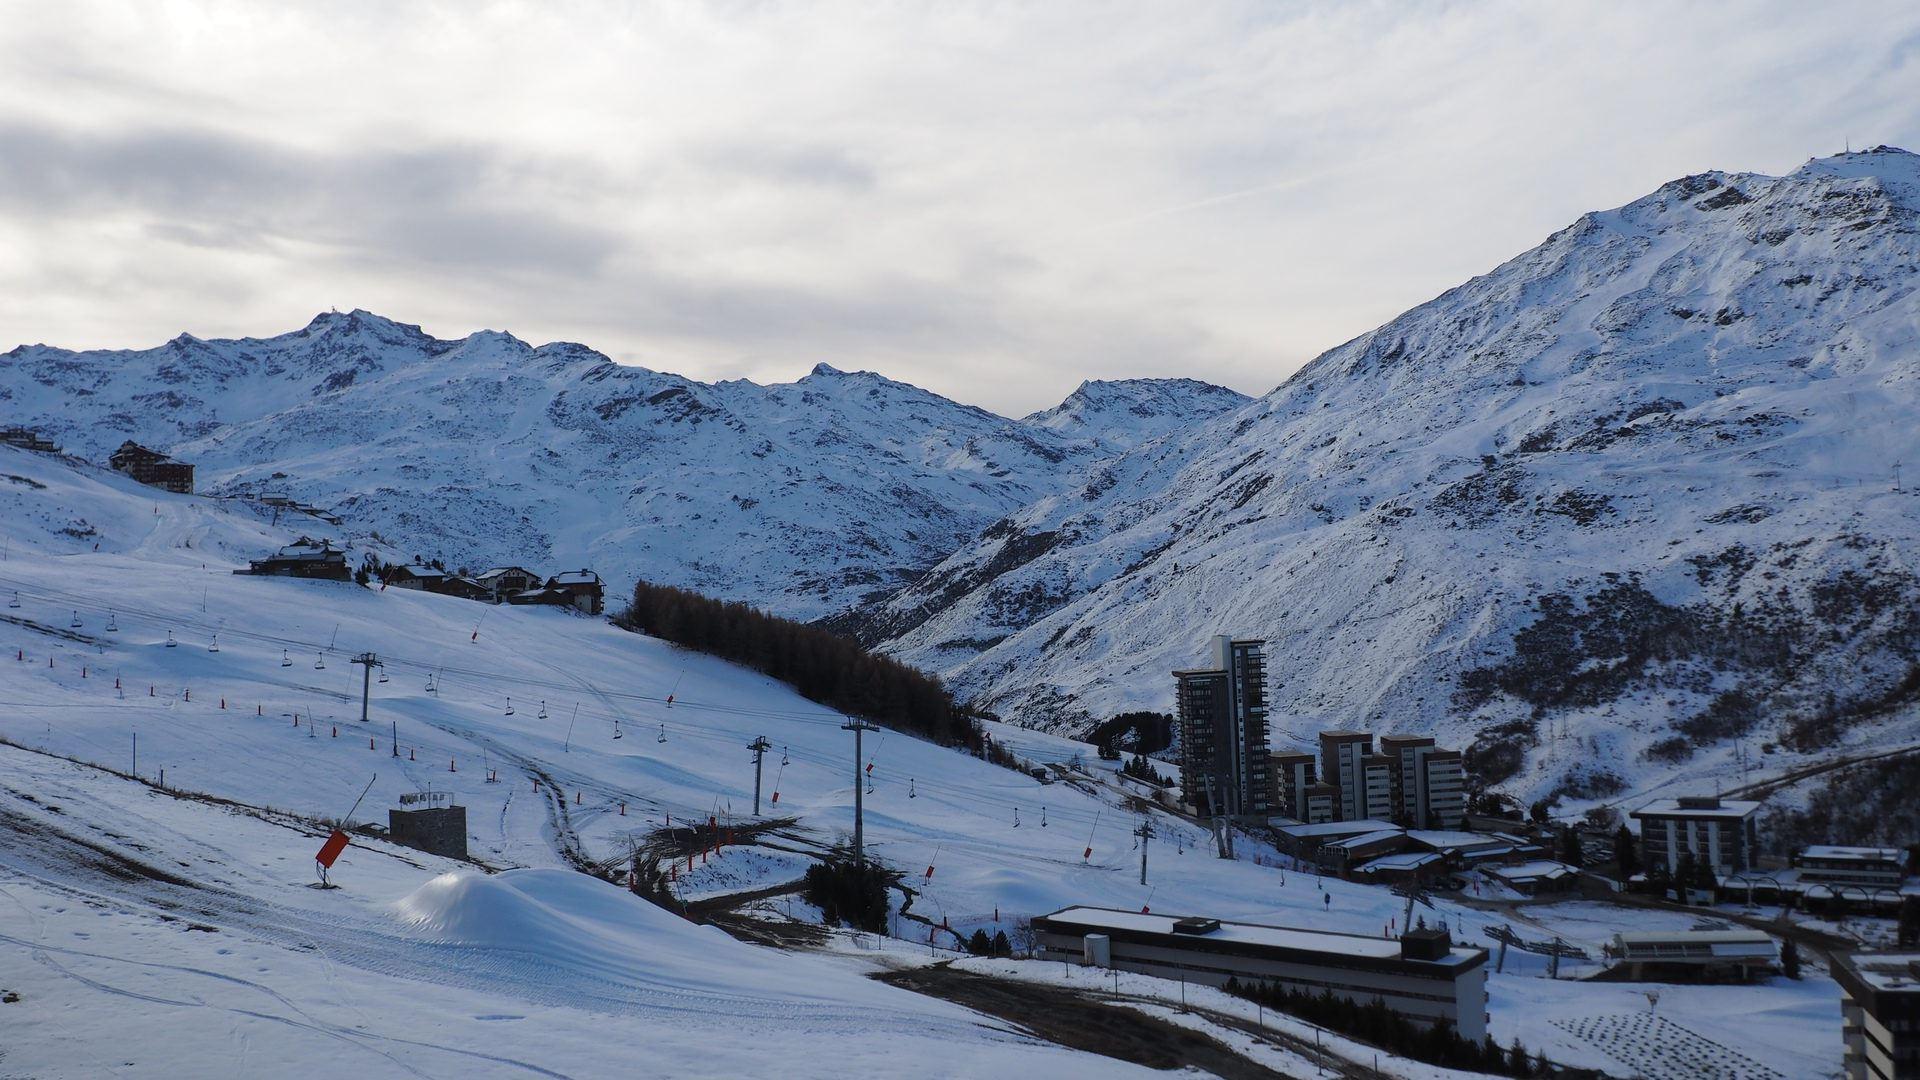 2 Pièces 5 Pers skis aux pieds / EVONS 606